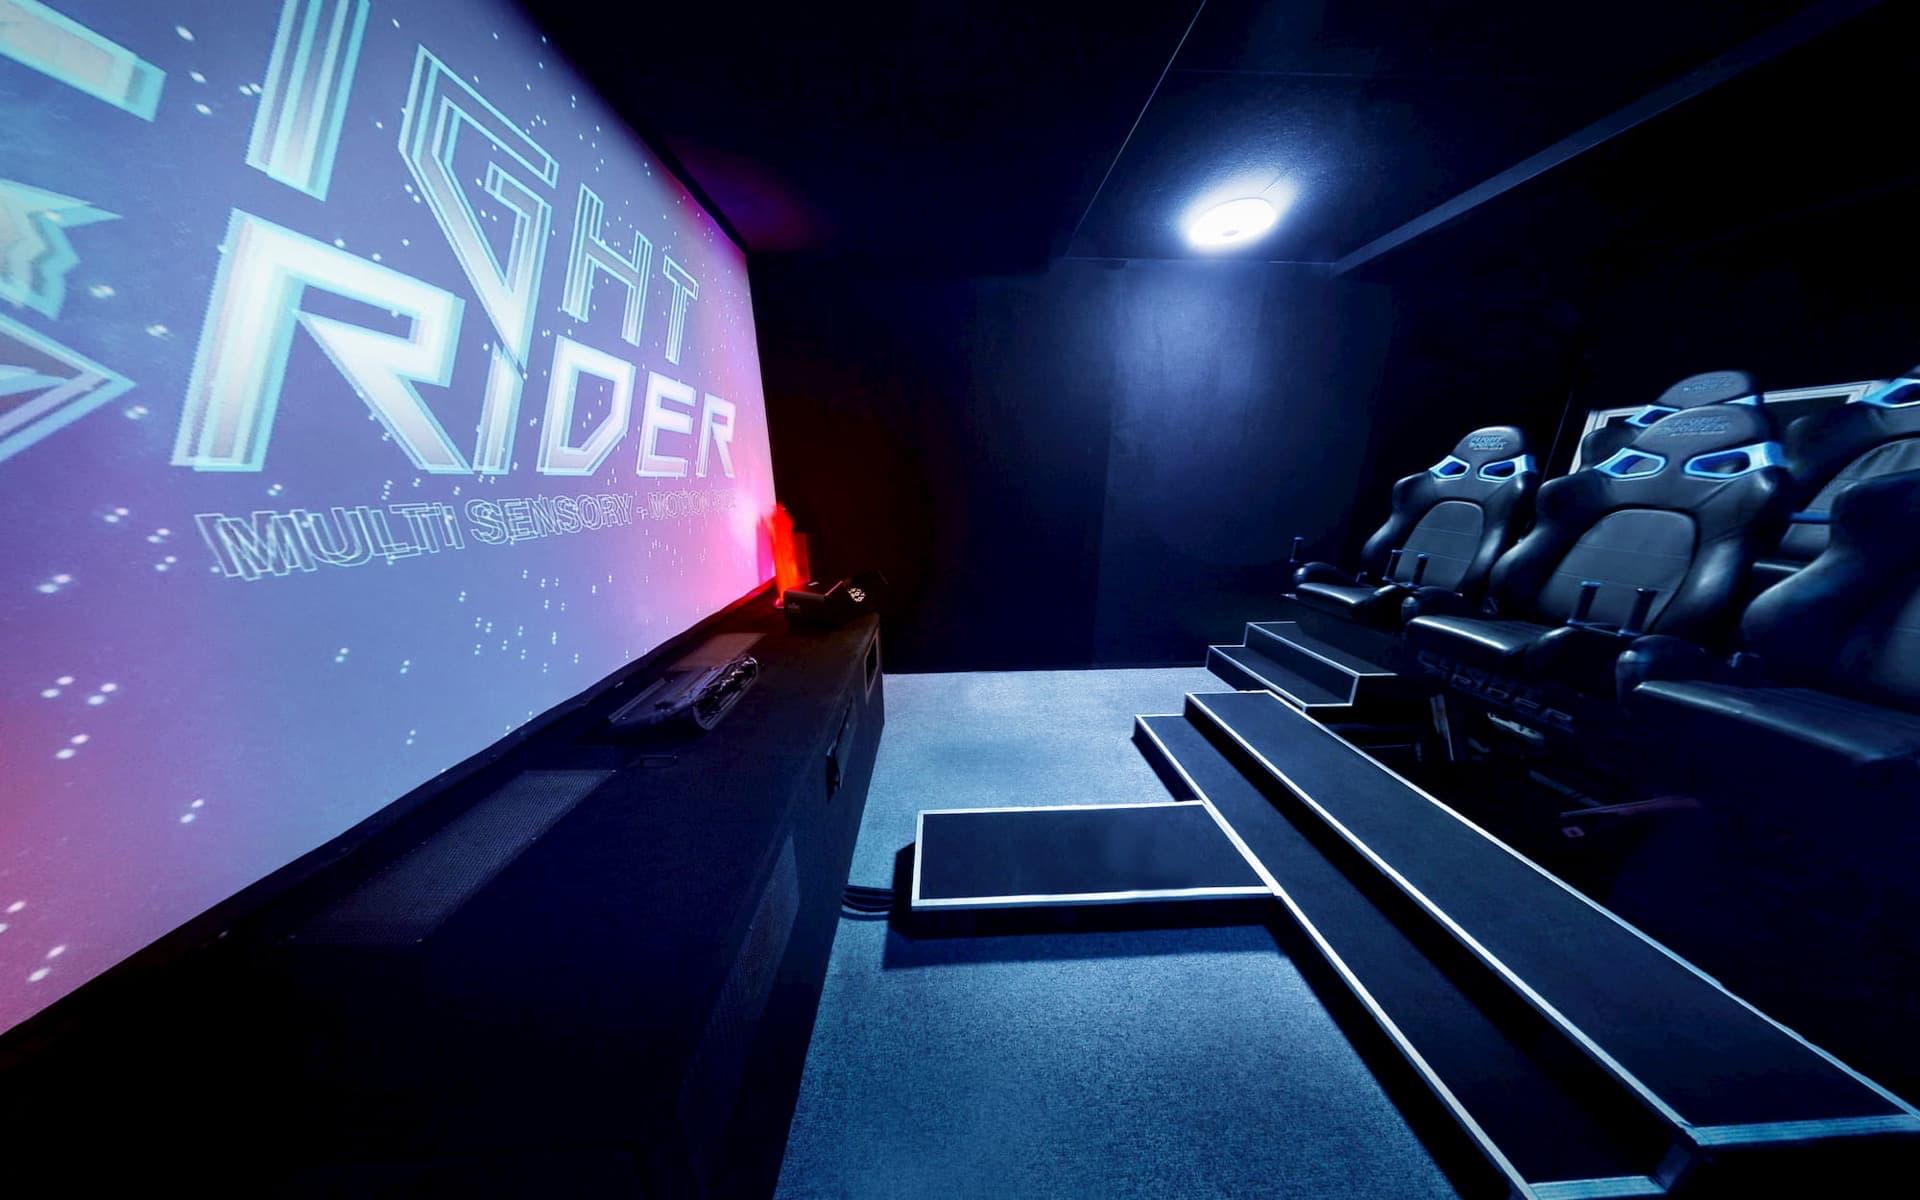 Flight Rider - XD Cinema